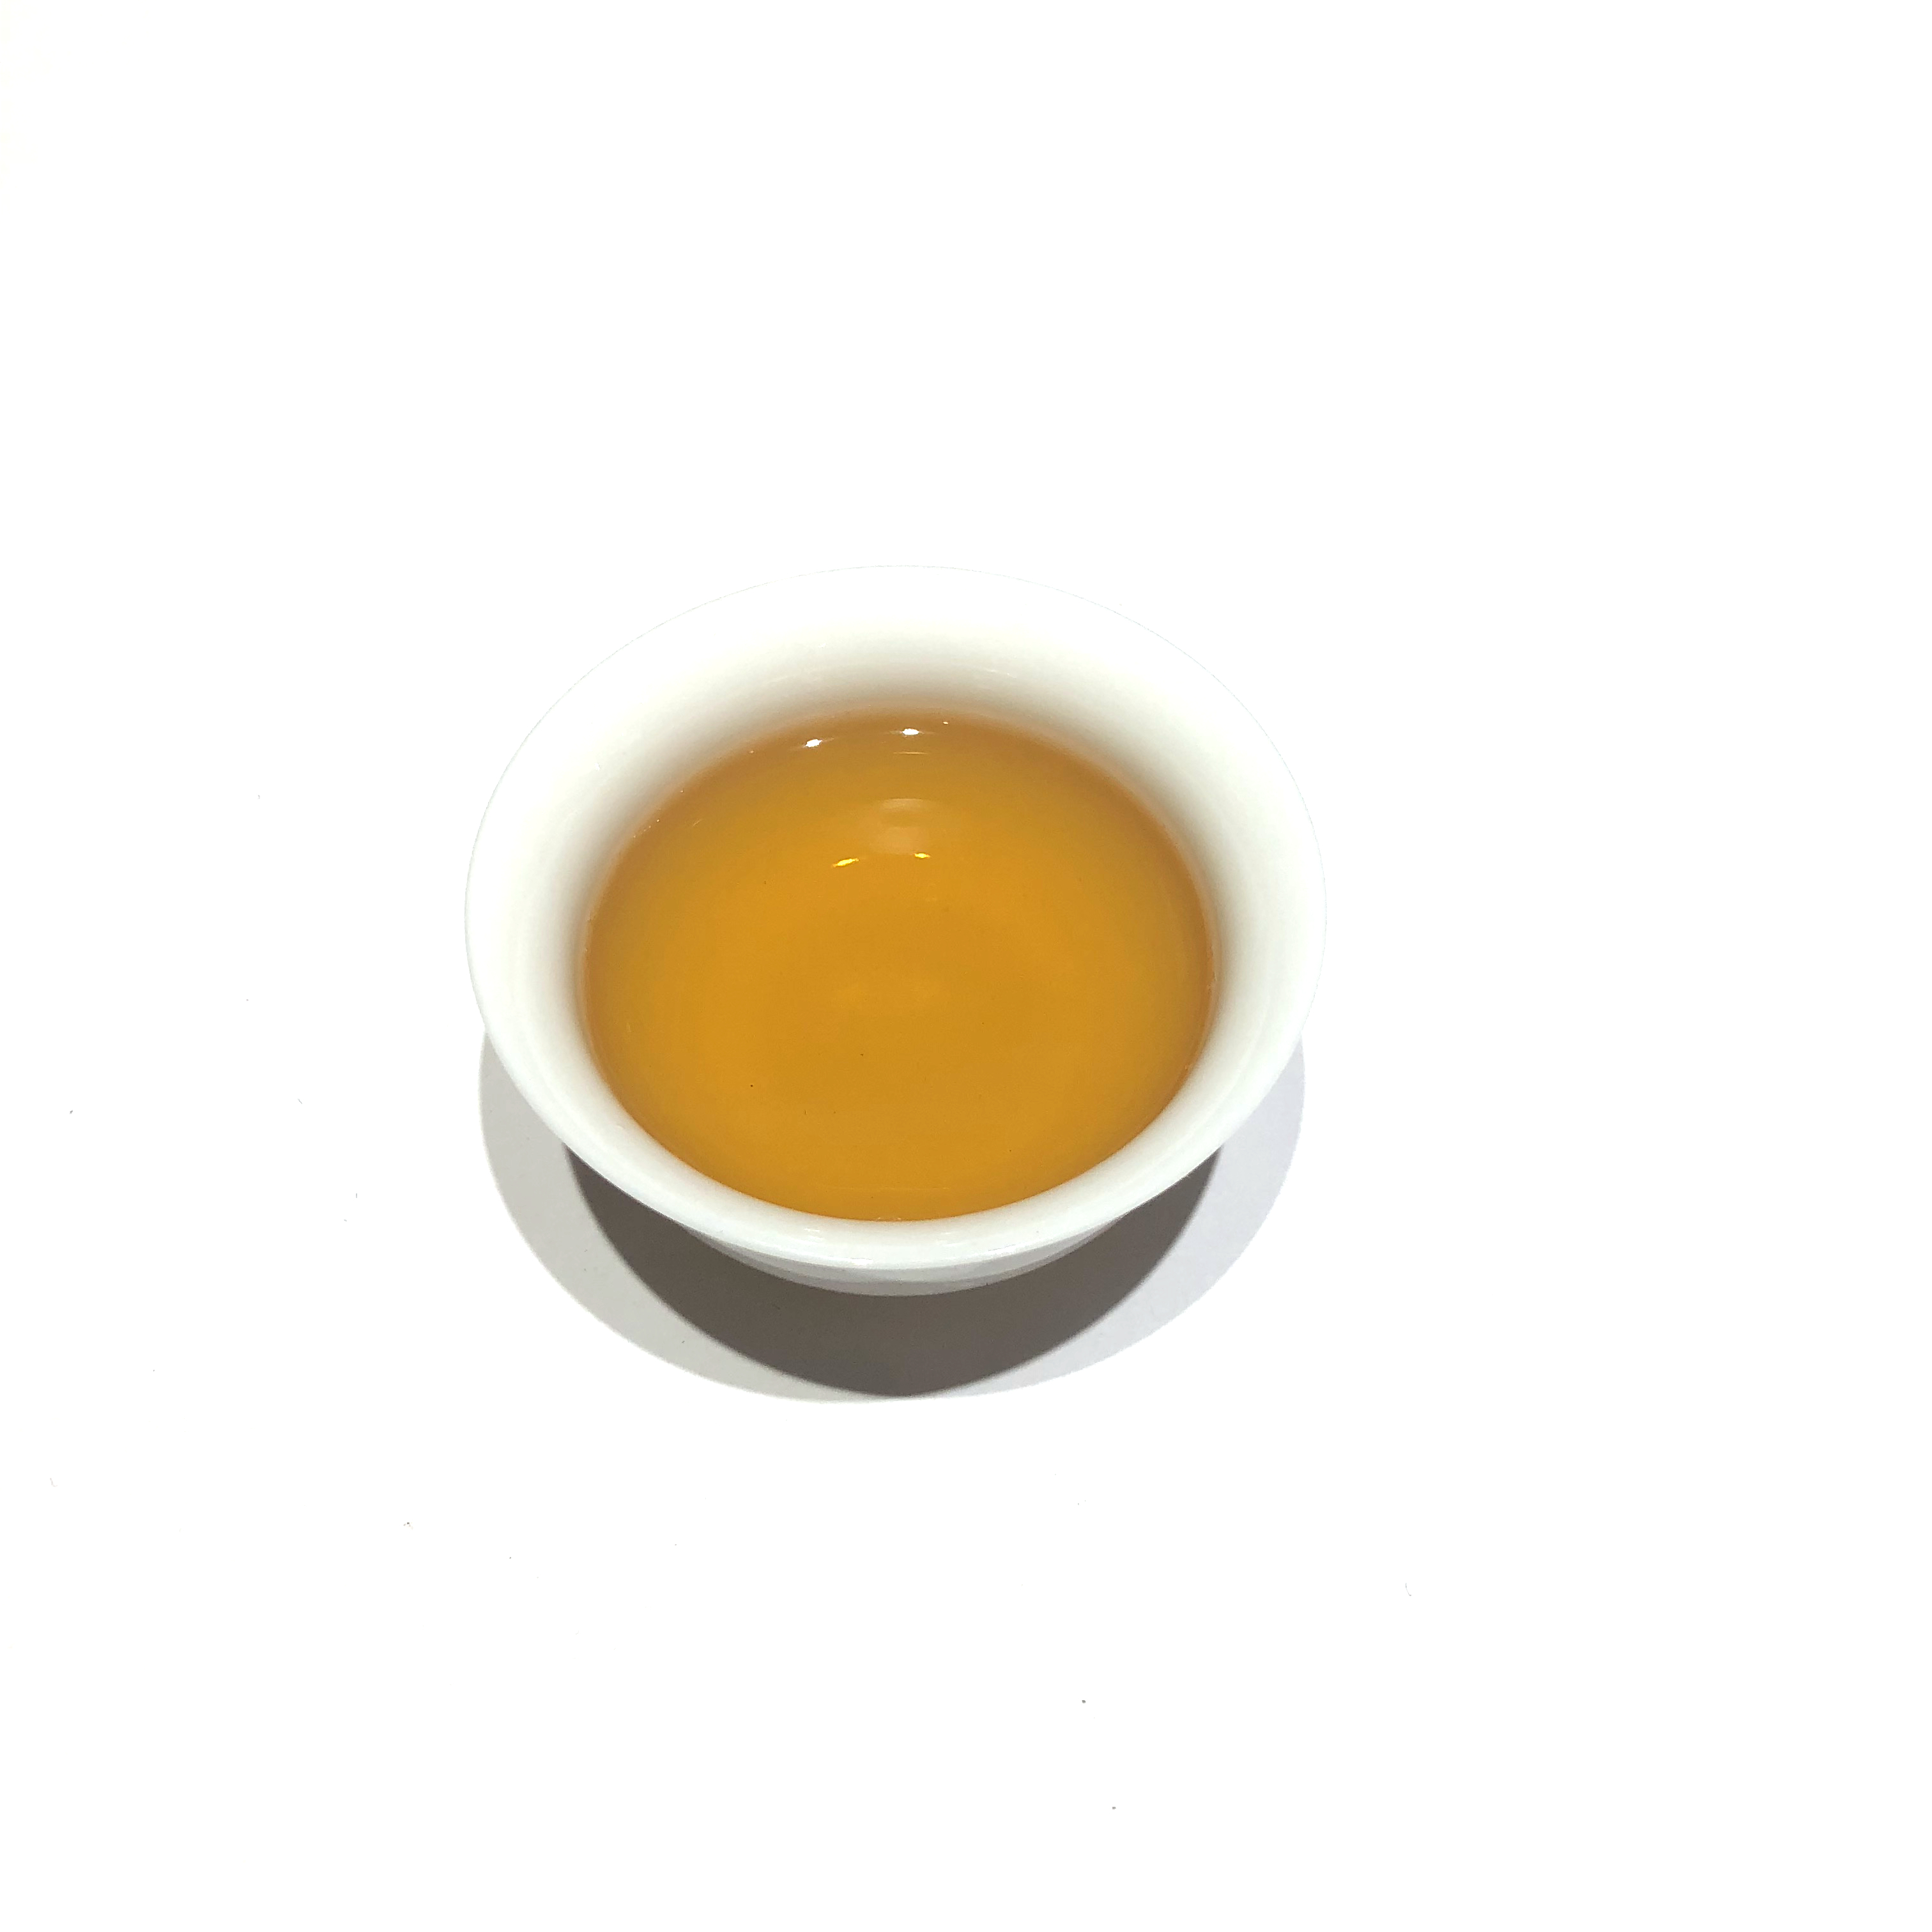 Popular Giftpacking Benefits Blending Black Tea - 4uTea   4uTea.com